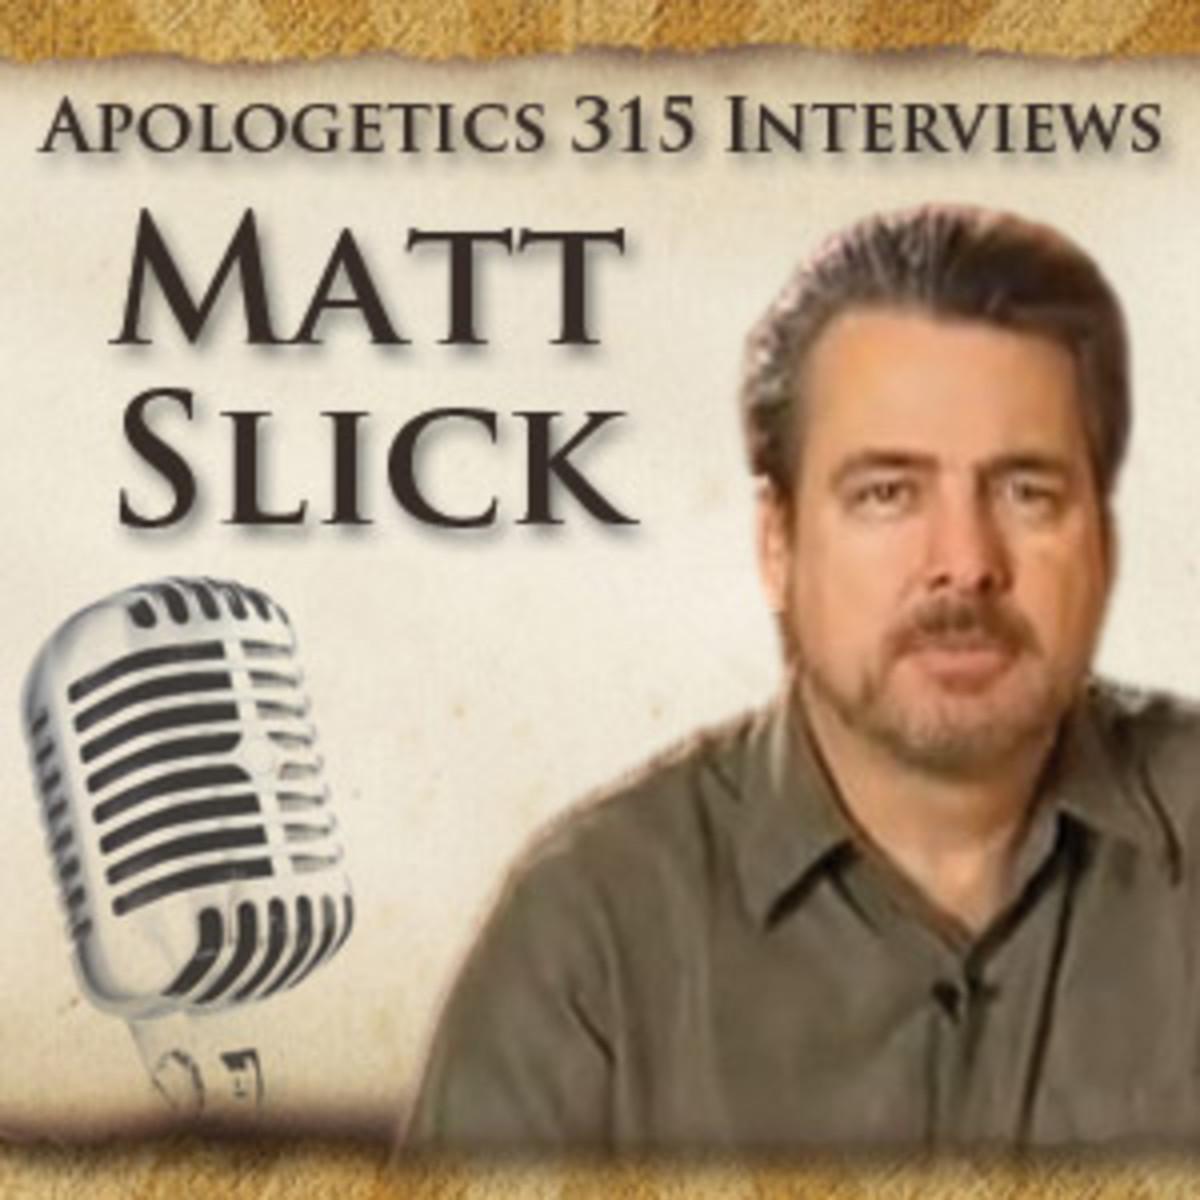 DEBATE: Matt Slick vs Fatfist on LOGICAL ABSOLUTES